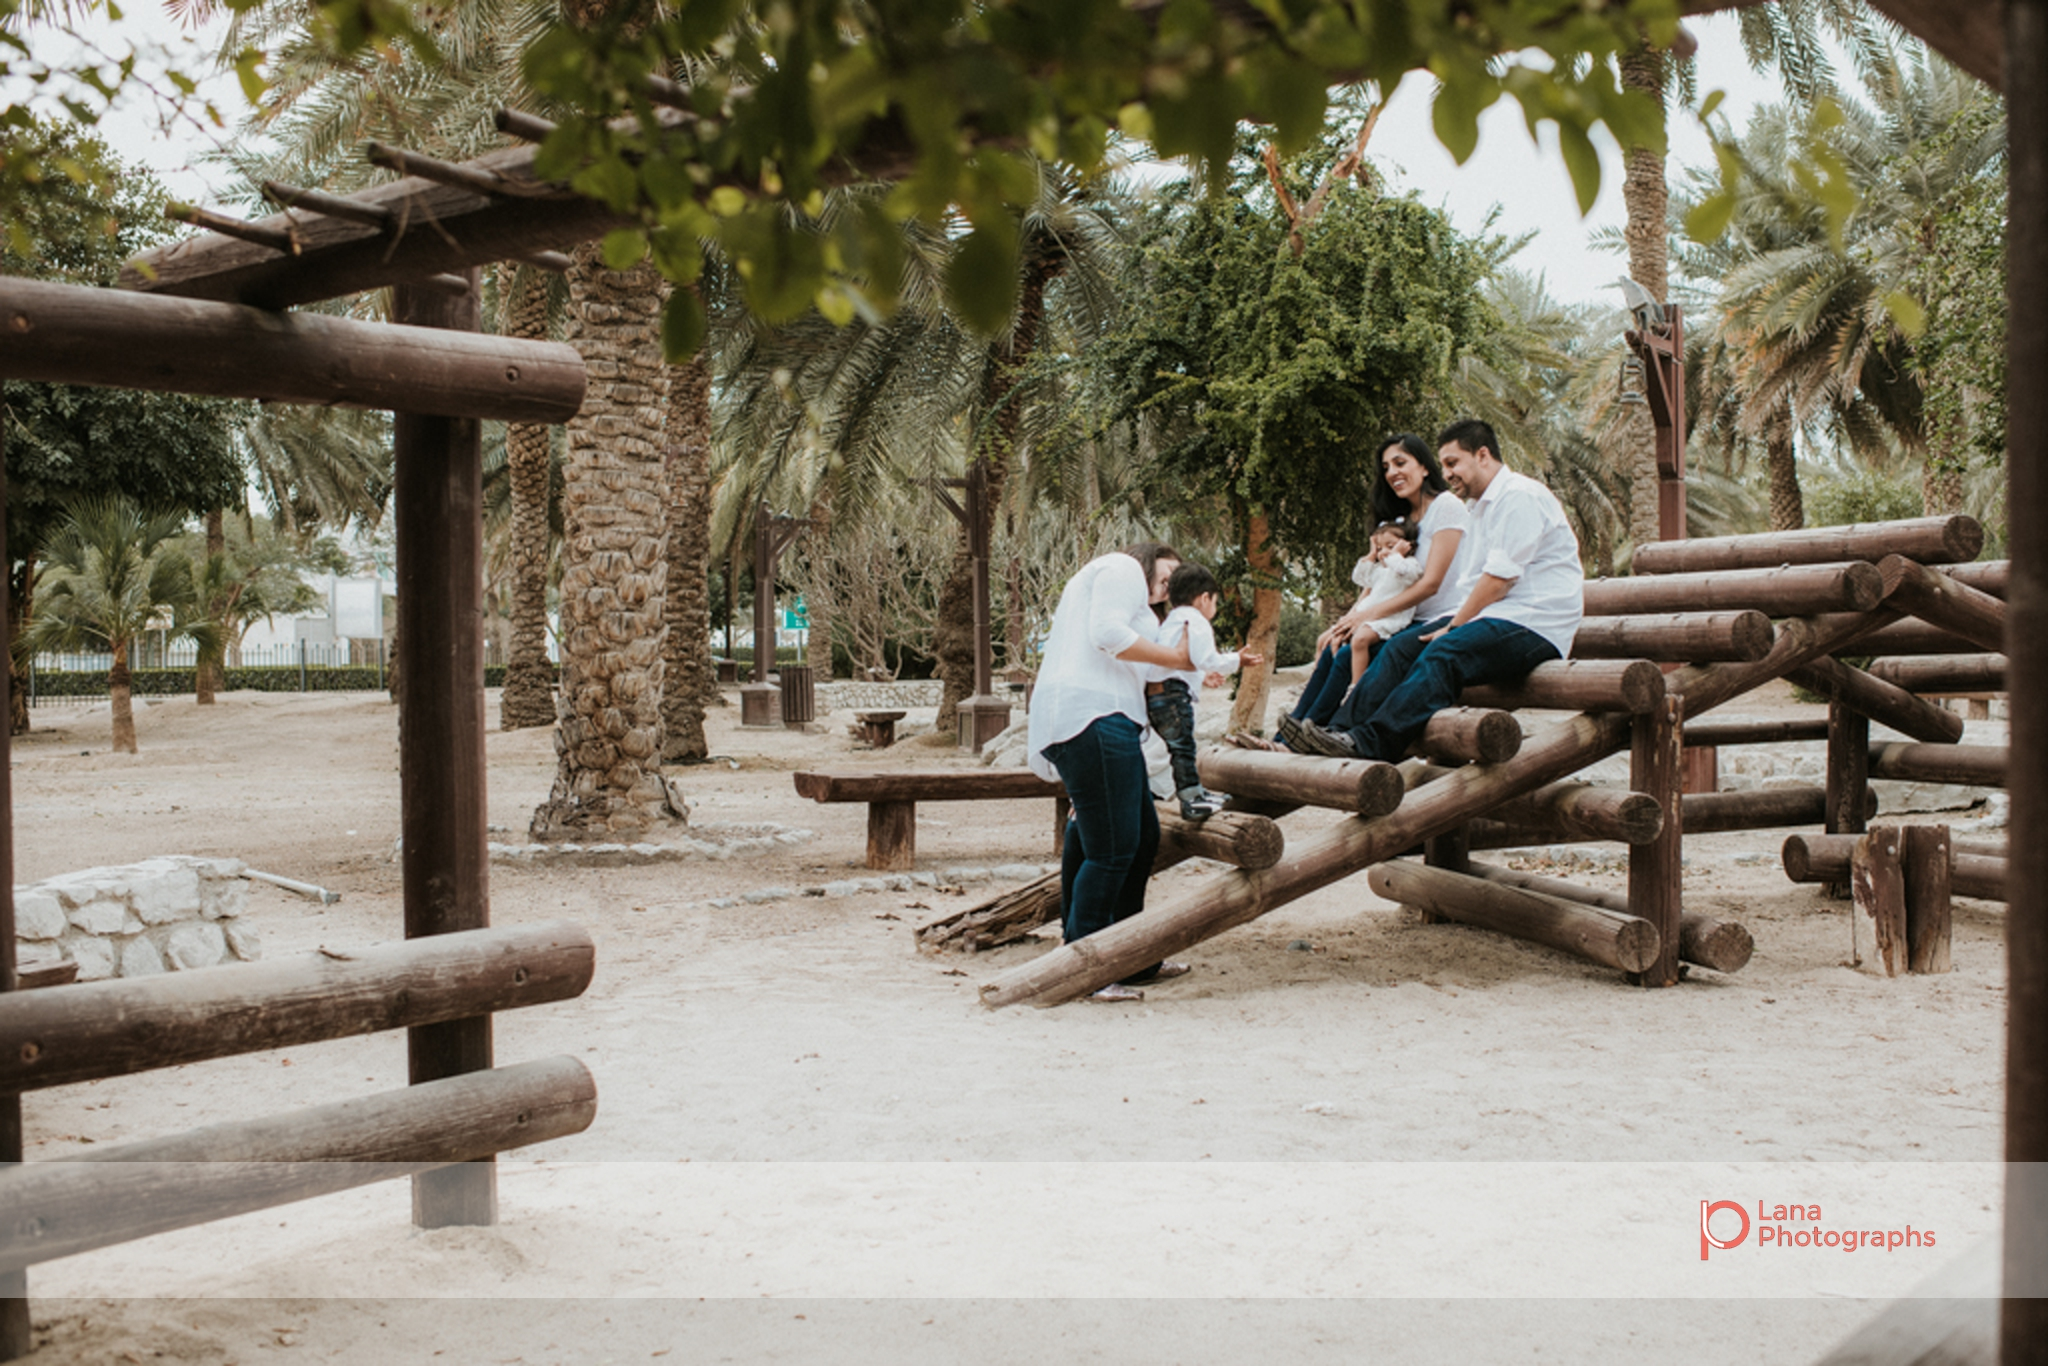 Lana Photographs Family Photographer Dubai Top Family Photographers family sitting in the park on benches